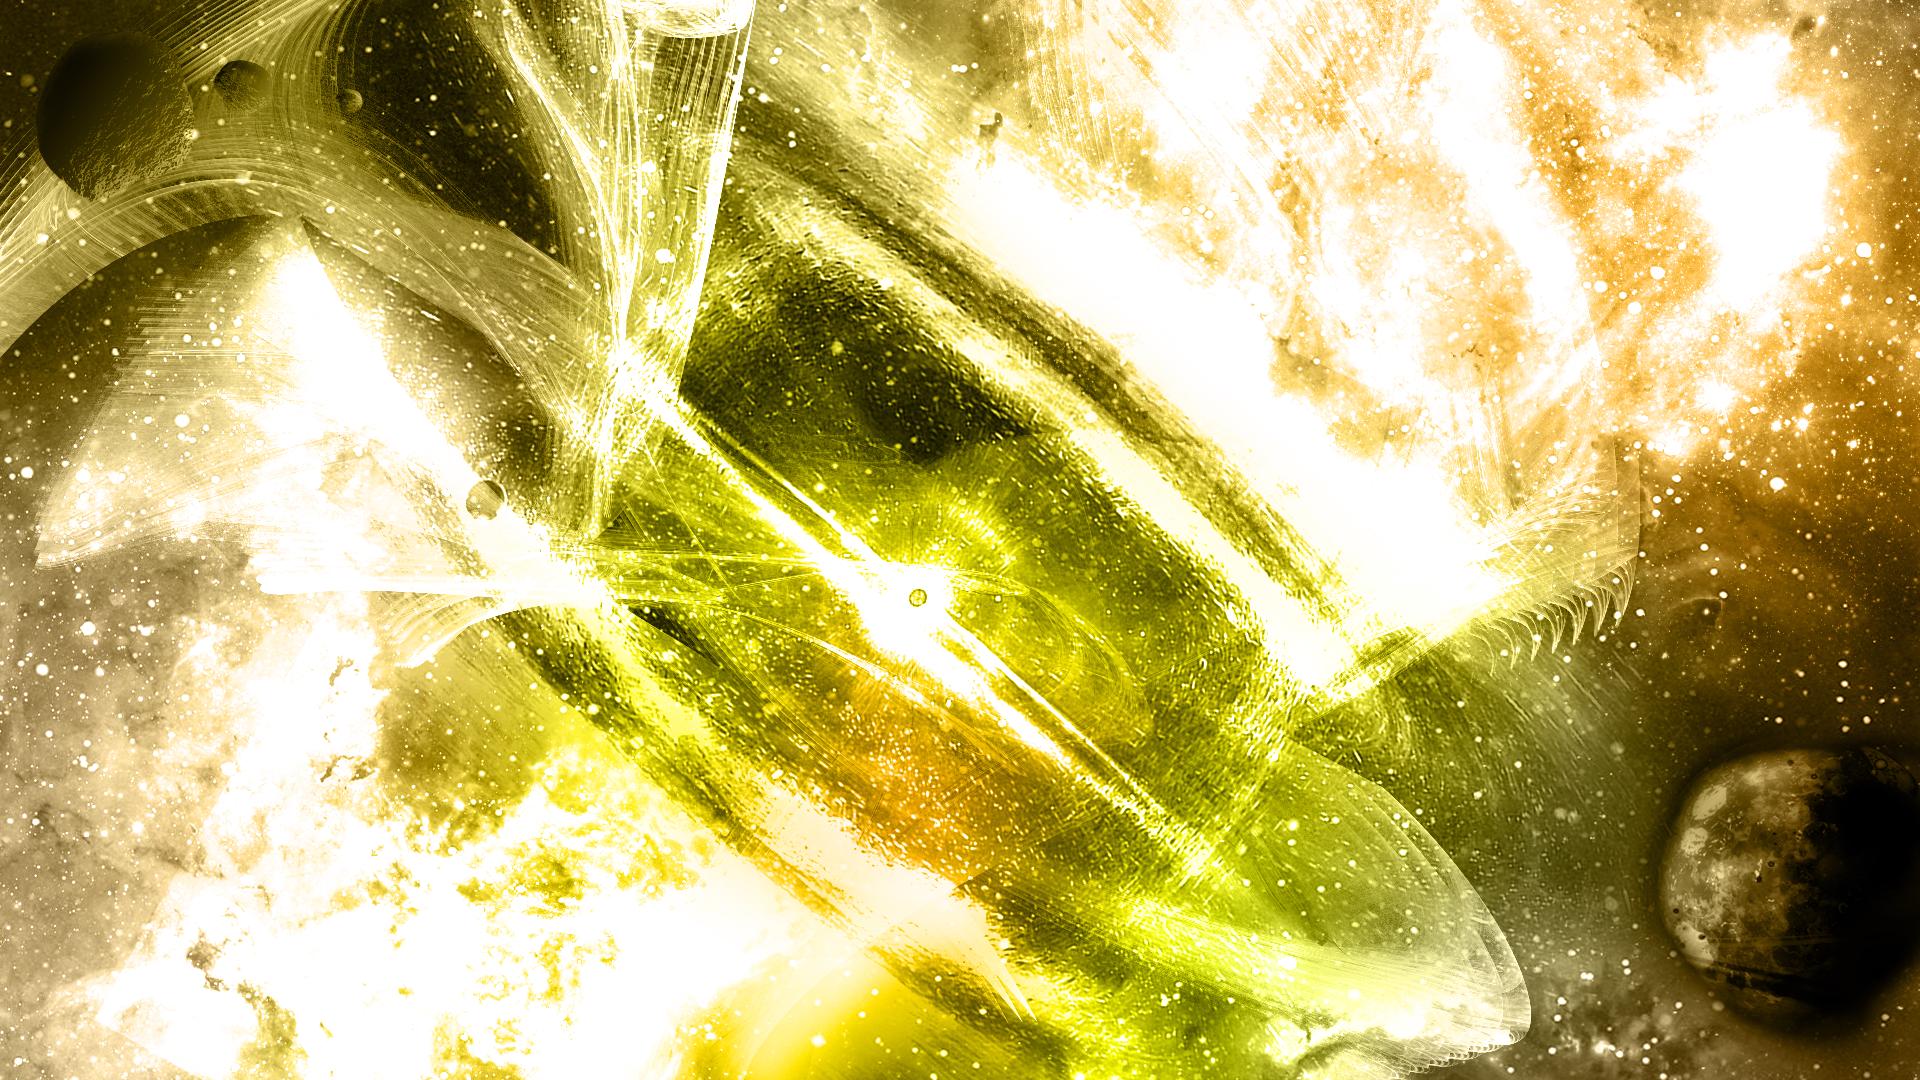 golden pyramid nebula - photo #39